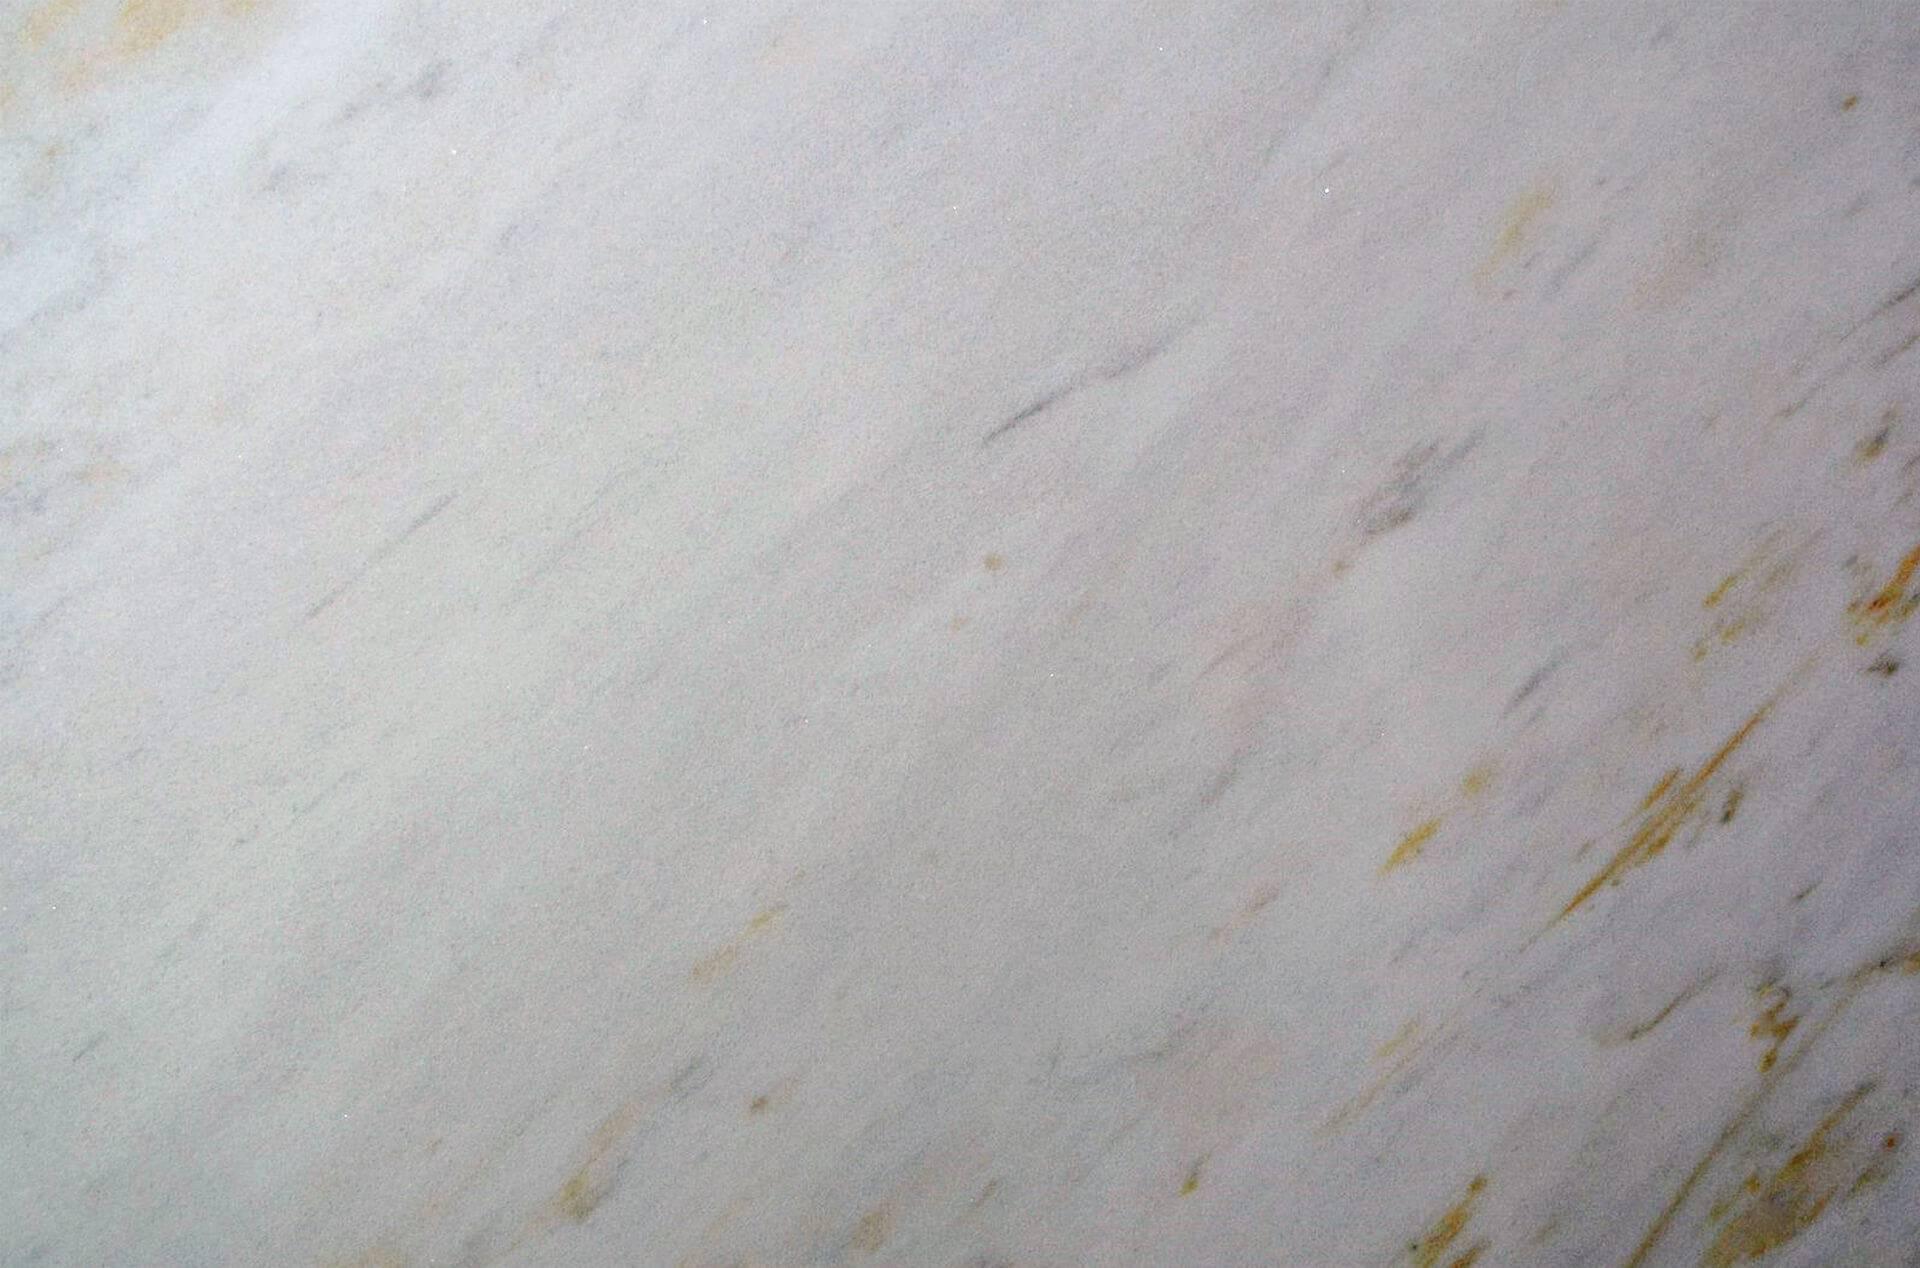 Sky White фото 1 — камень от Bevers Marmyr